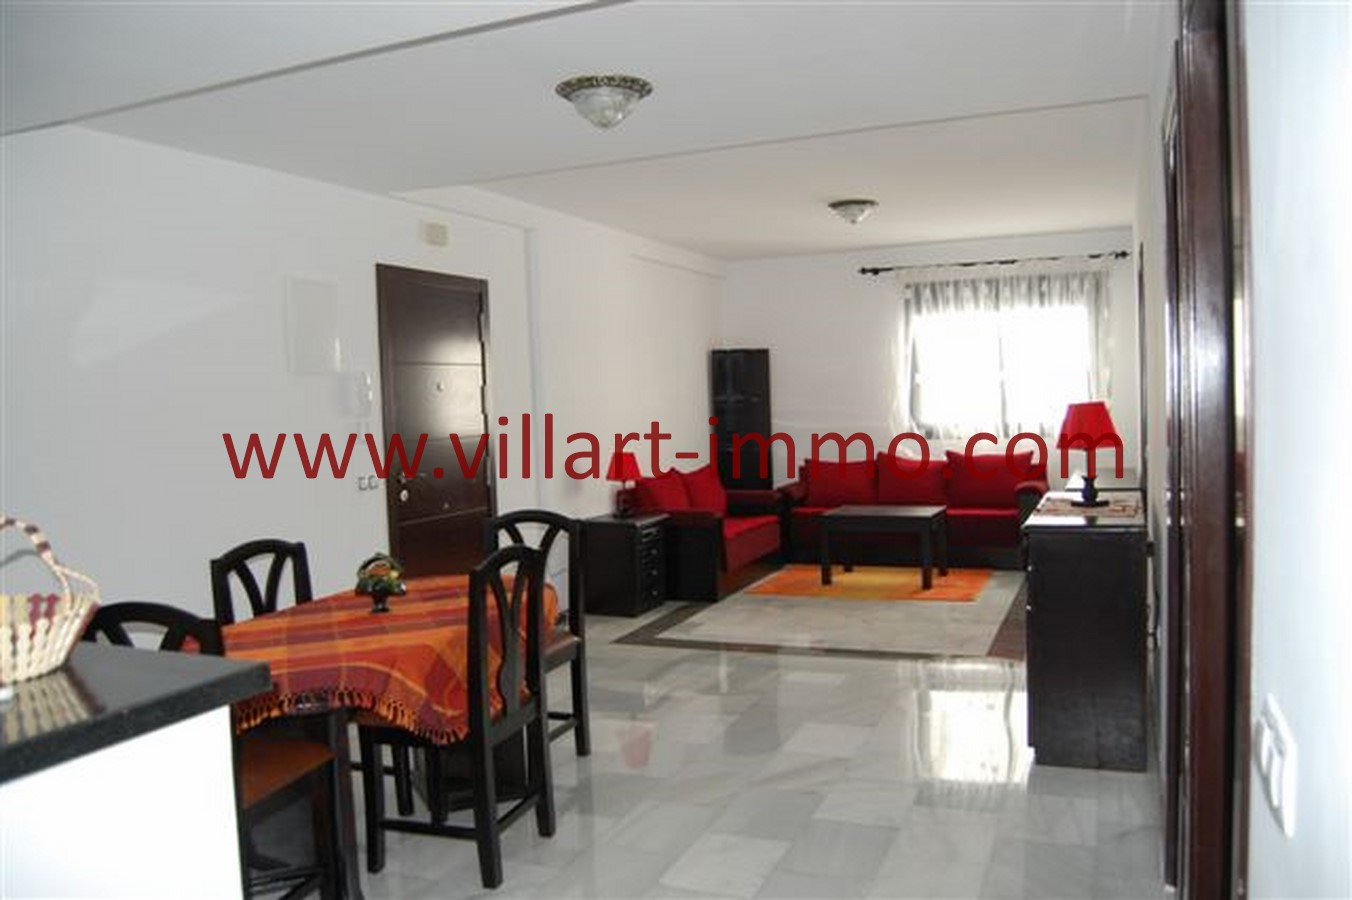 1-a-vendre-tanger-appartement-playa-salon-1-va417-villartimmo-agence-immobiliere